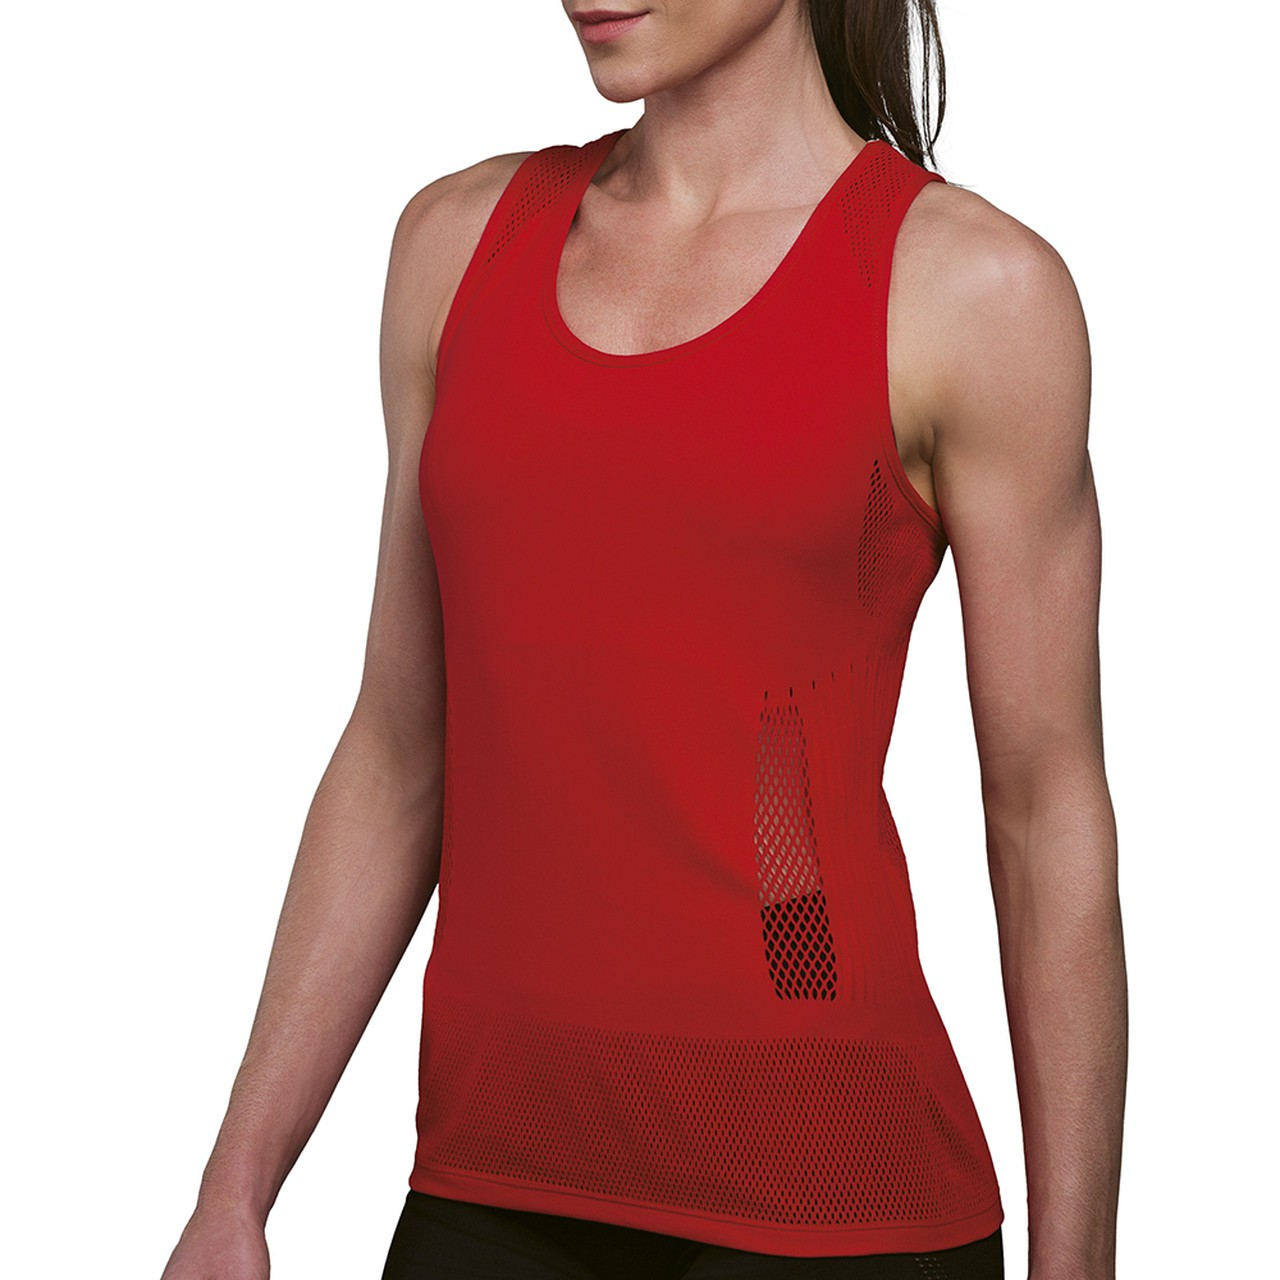 Camiseta regata feminina caminhada sem costura nadador